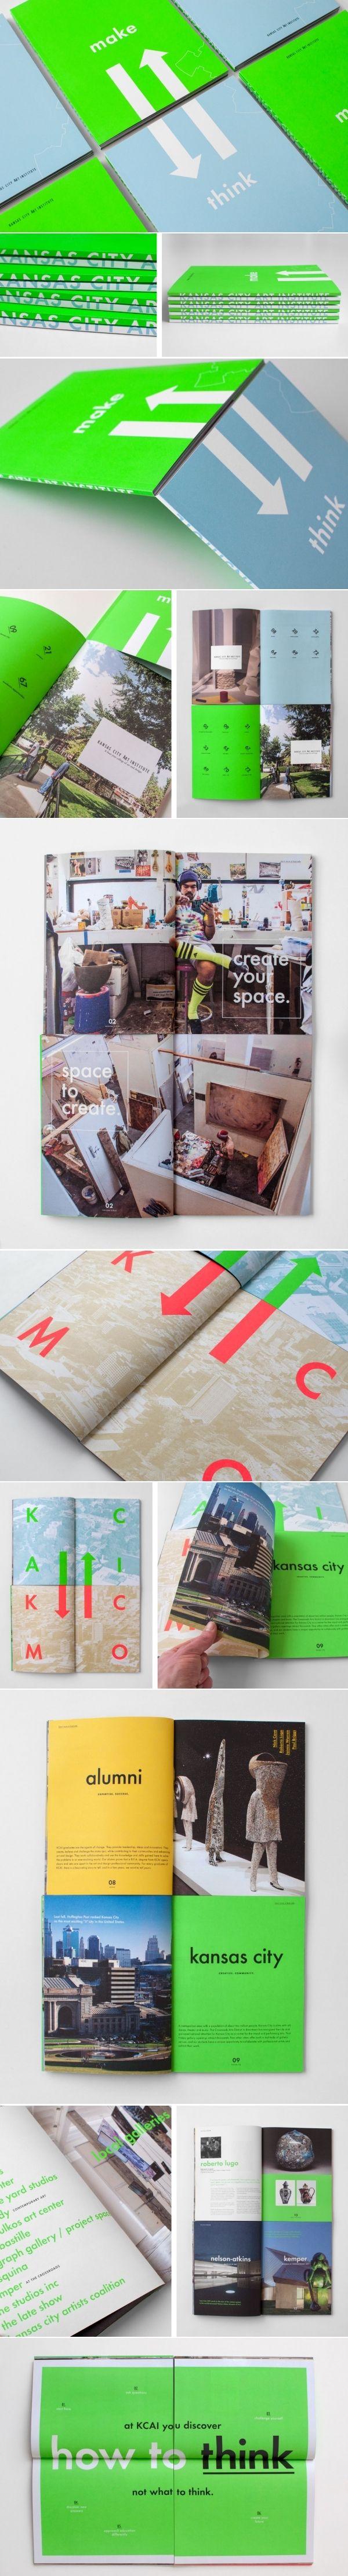 Kansas City Art Institute | Copywriting, Design, Marketing Materials | Design Ranch